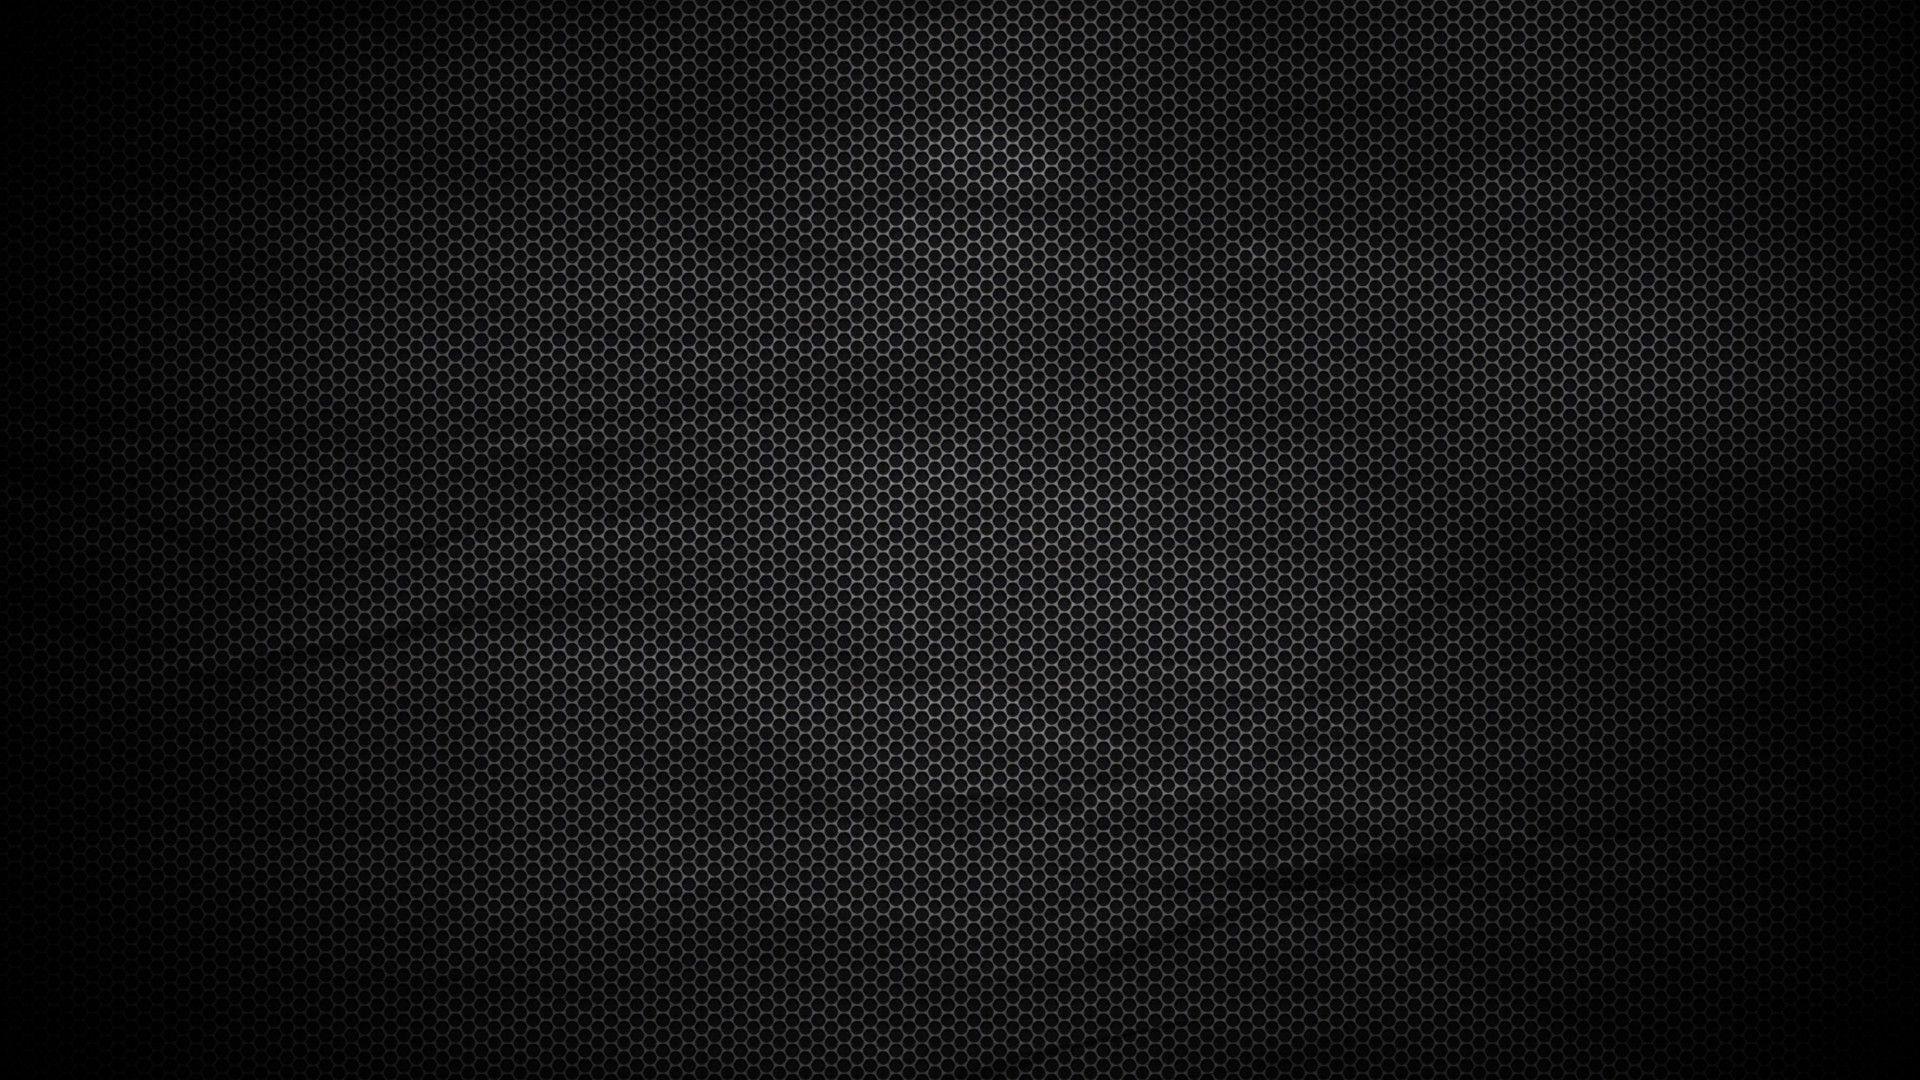 4K Ultra HD Dark Wallpapers - Top Free 4K Ultra HD Dark ...